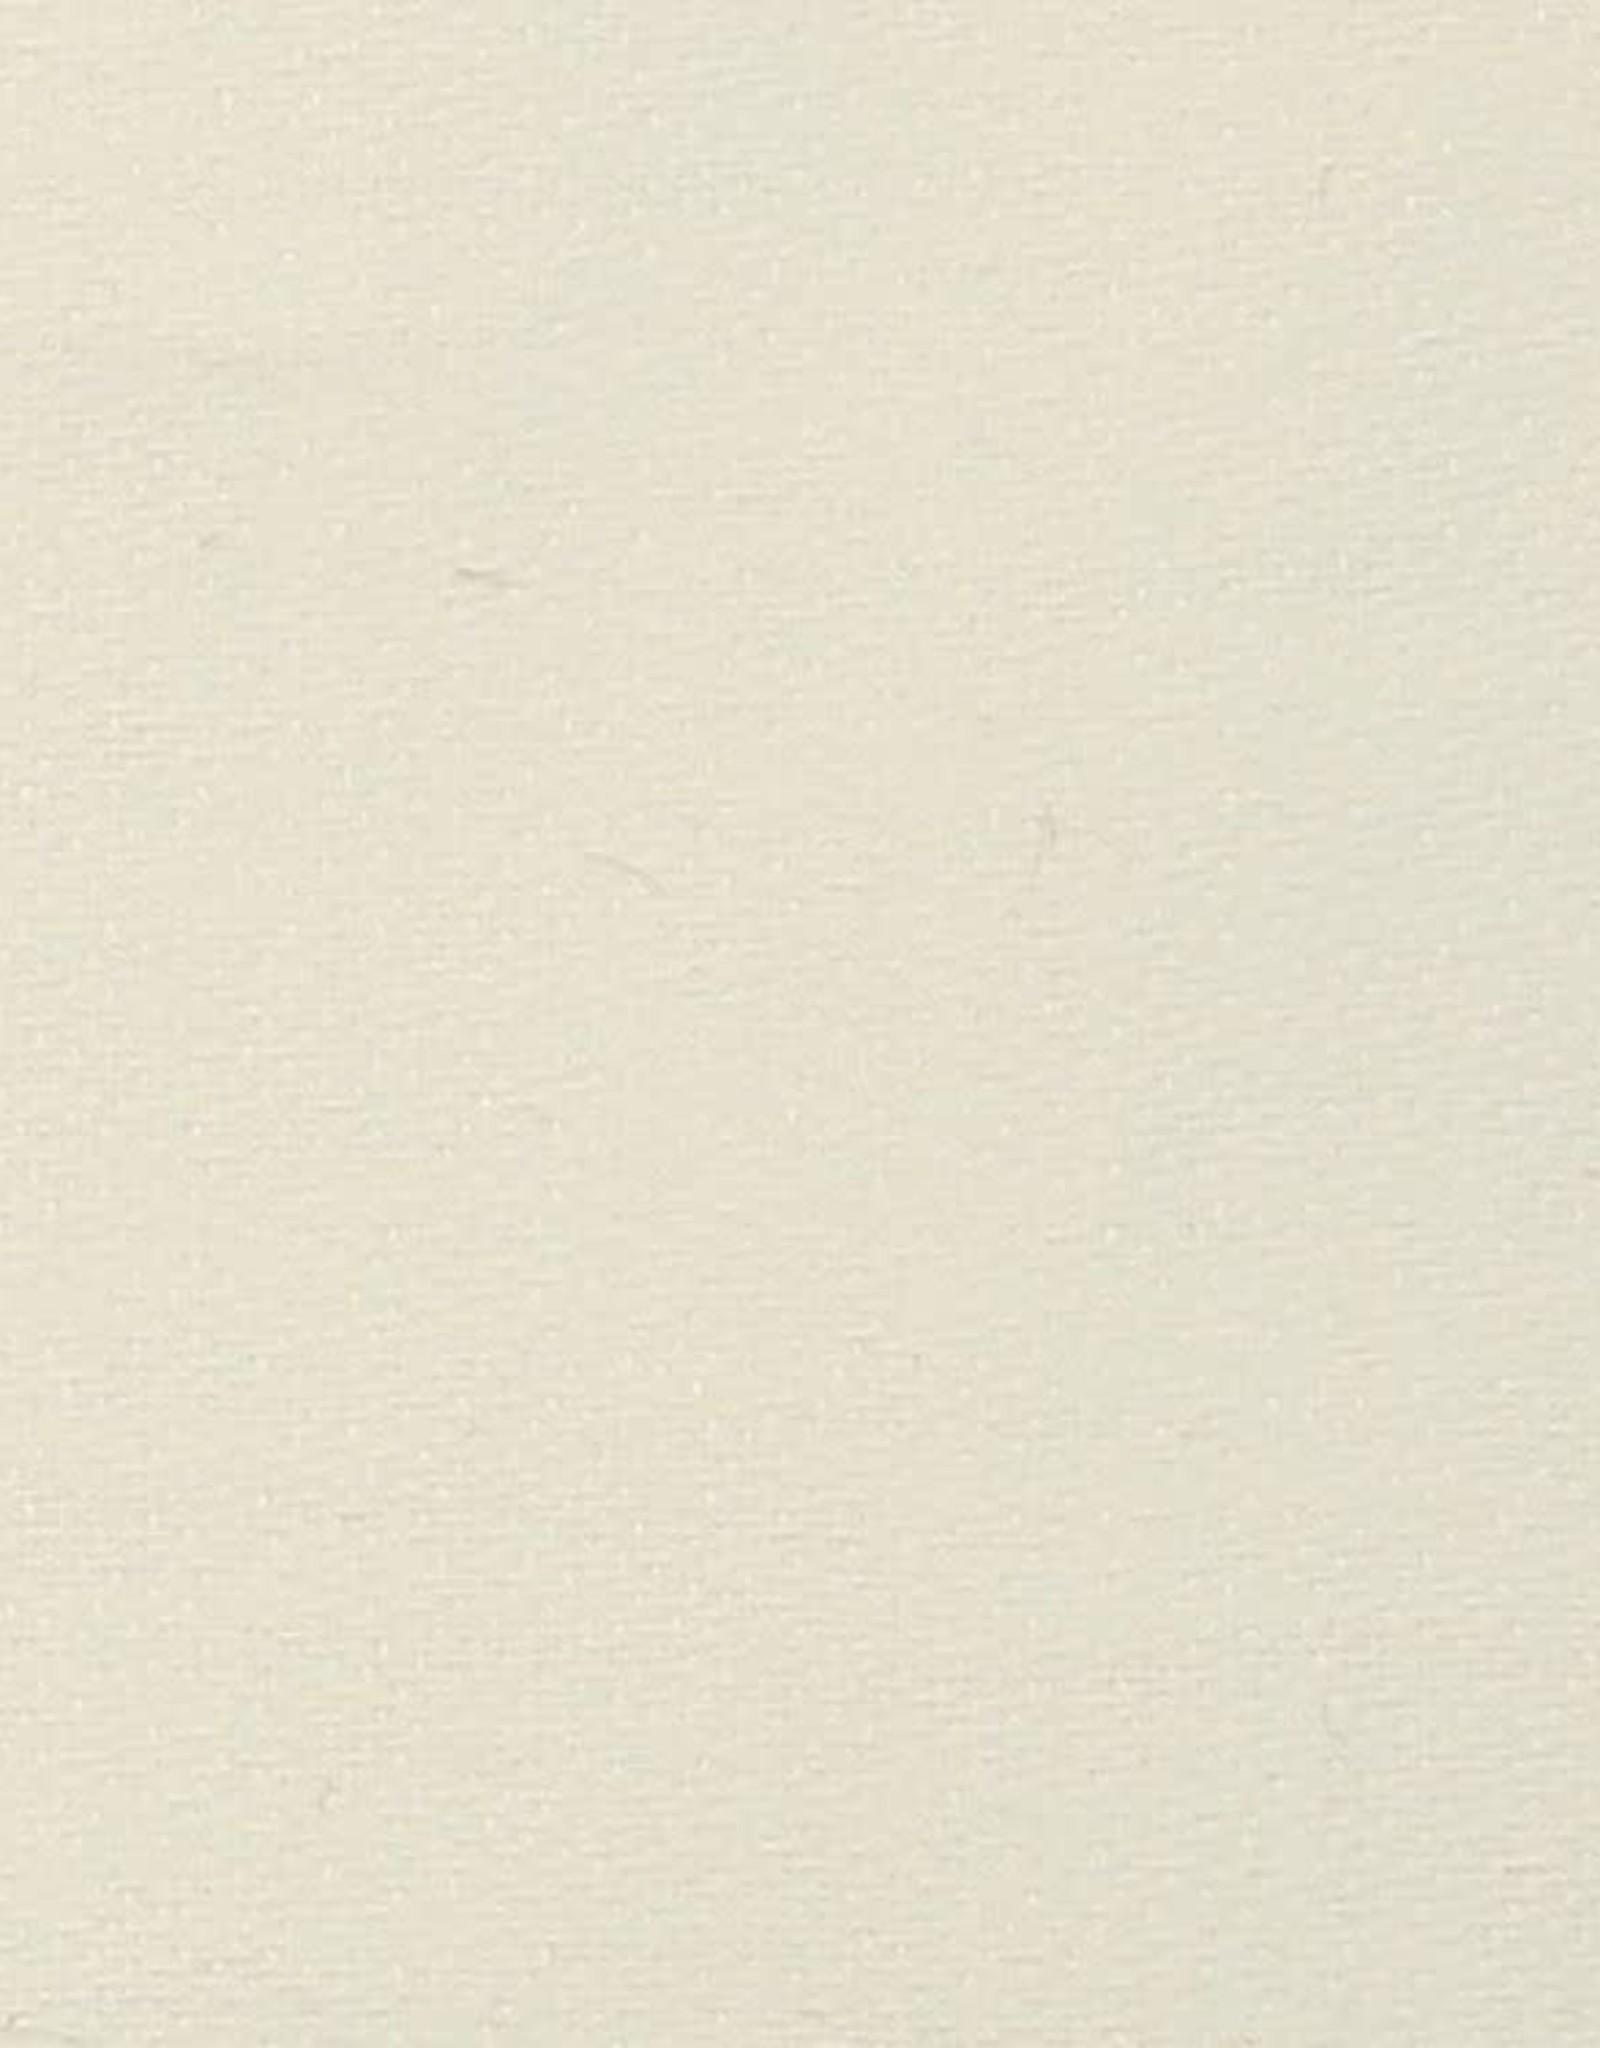 Satijn Katoen Wit PFD 137 cm breed